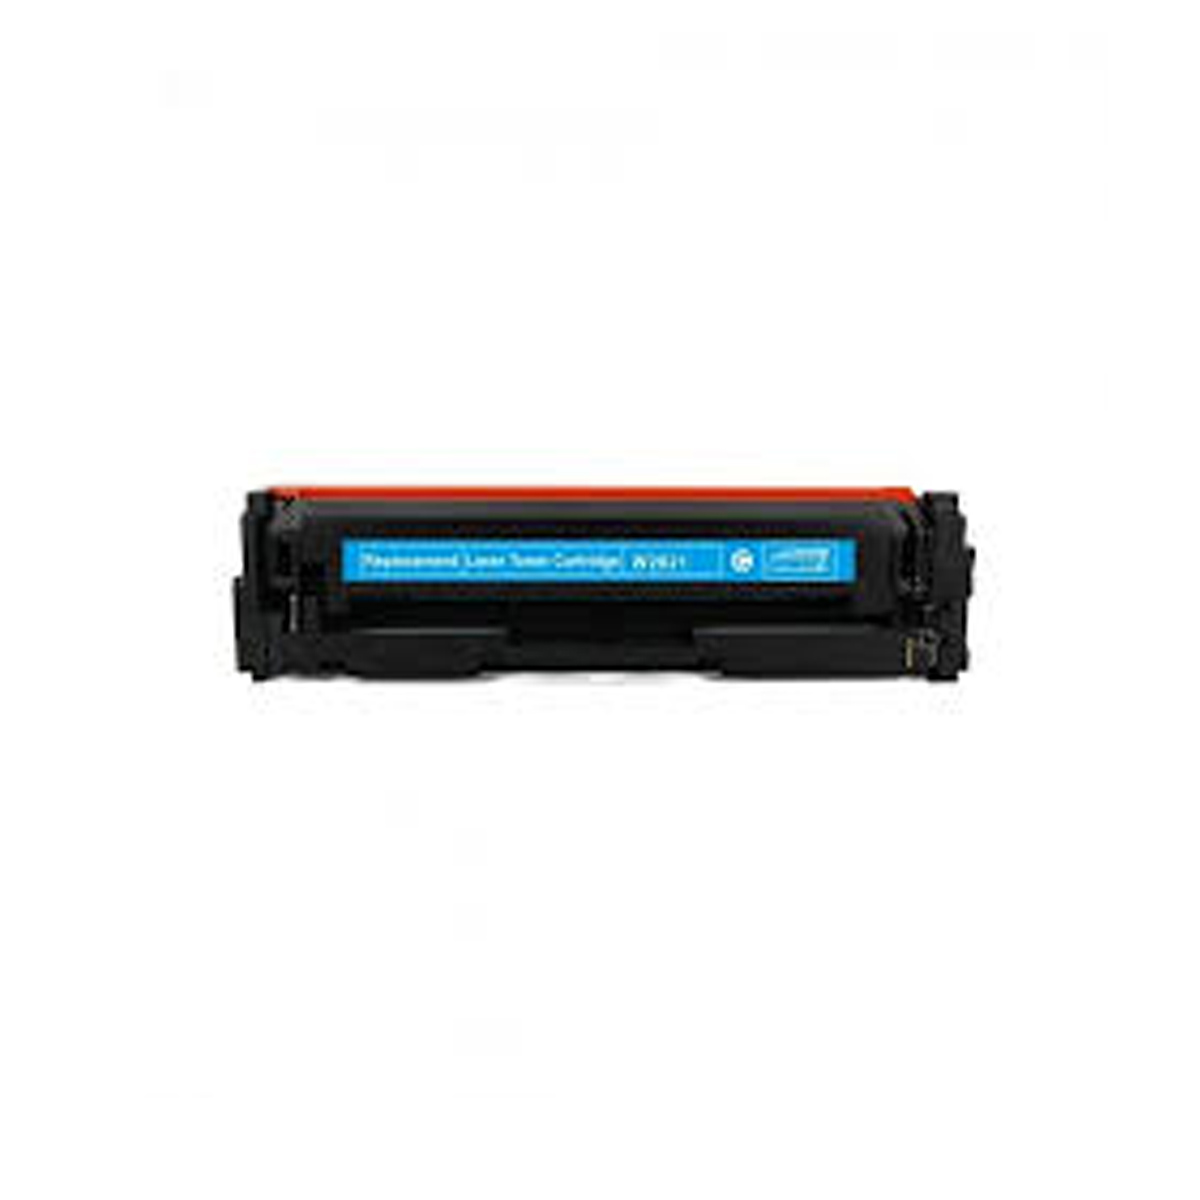 Toner Compativel com HP W2021A 2021a W2021 414A Ciano - M454DW M454 M479 SEM CHIP 2.1k